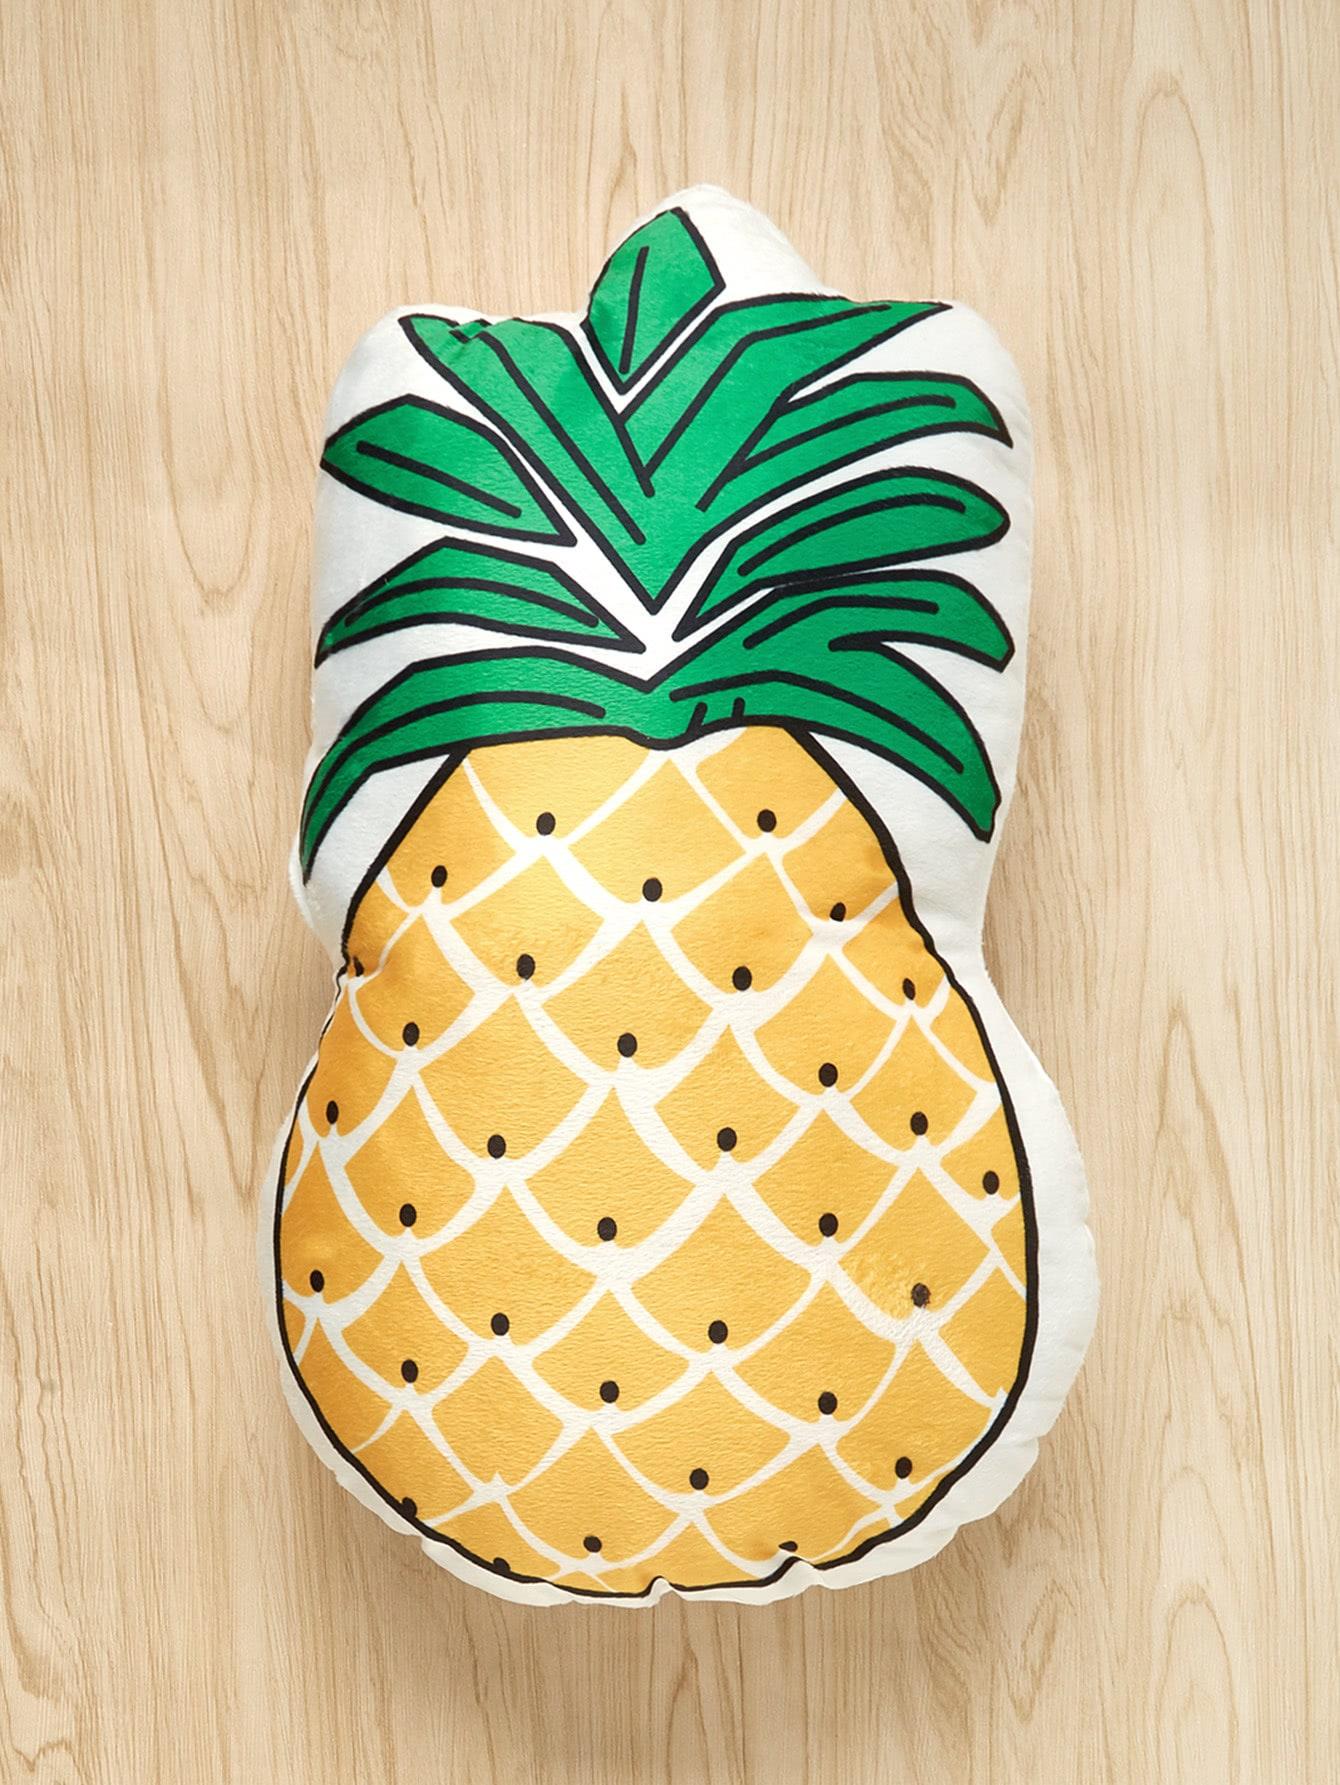 Pineapple Shaped Decorative Pillow